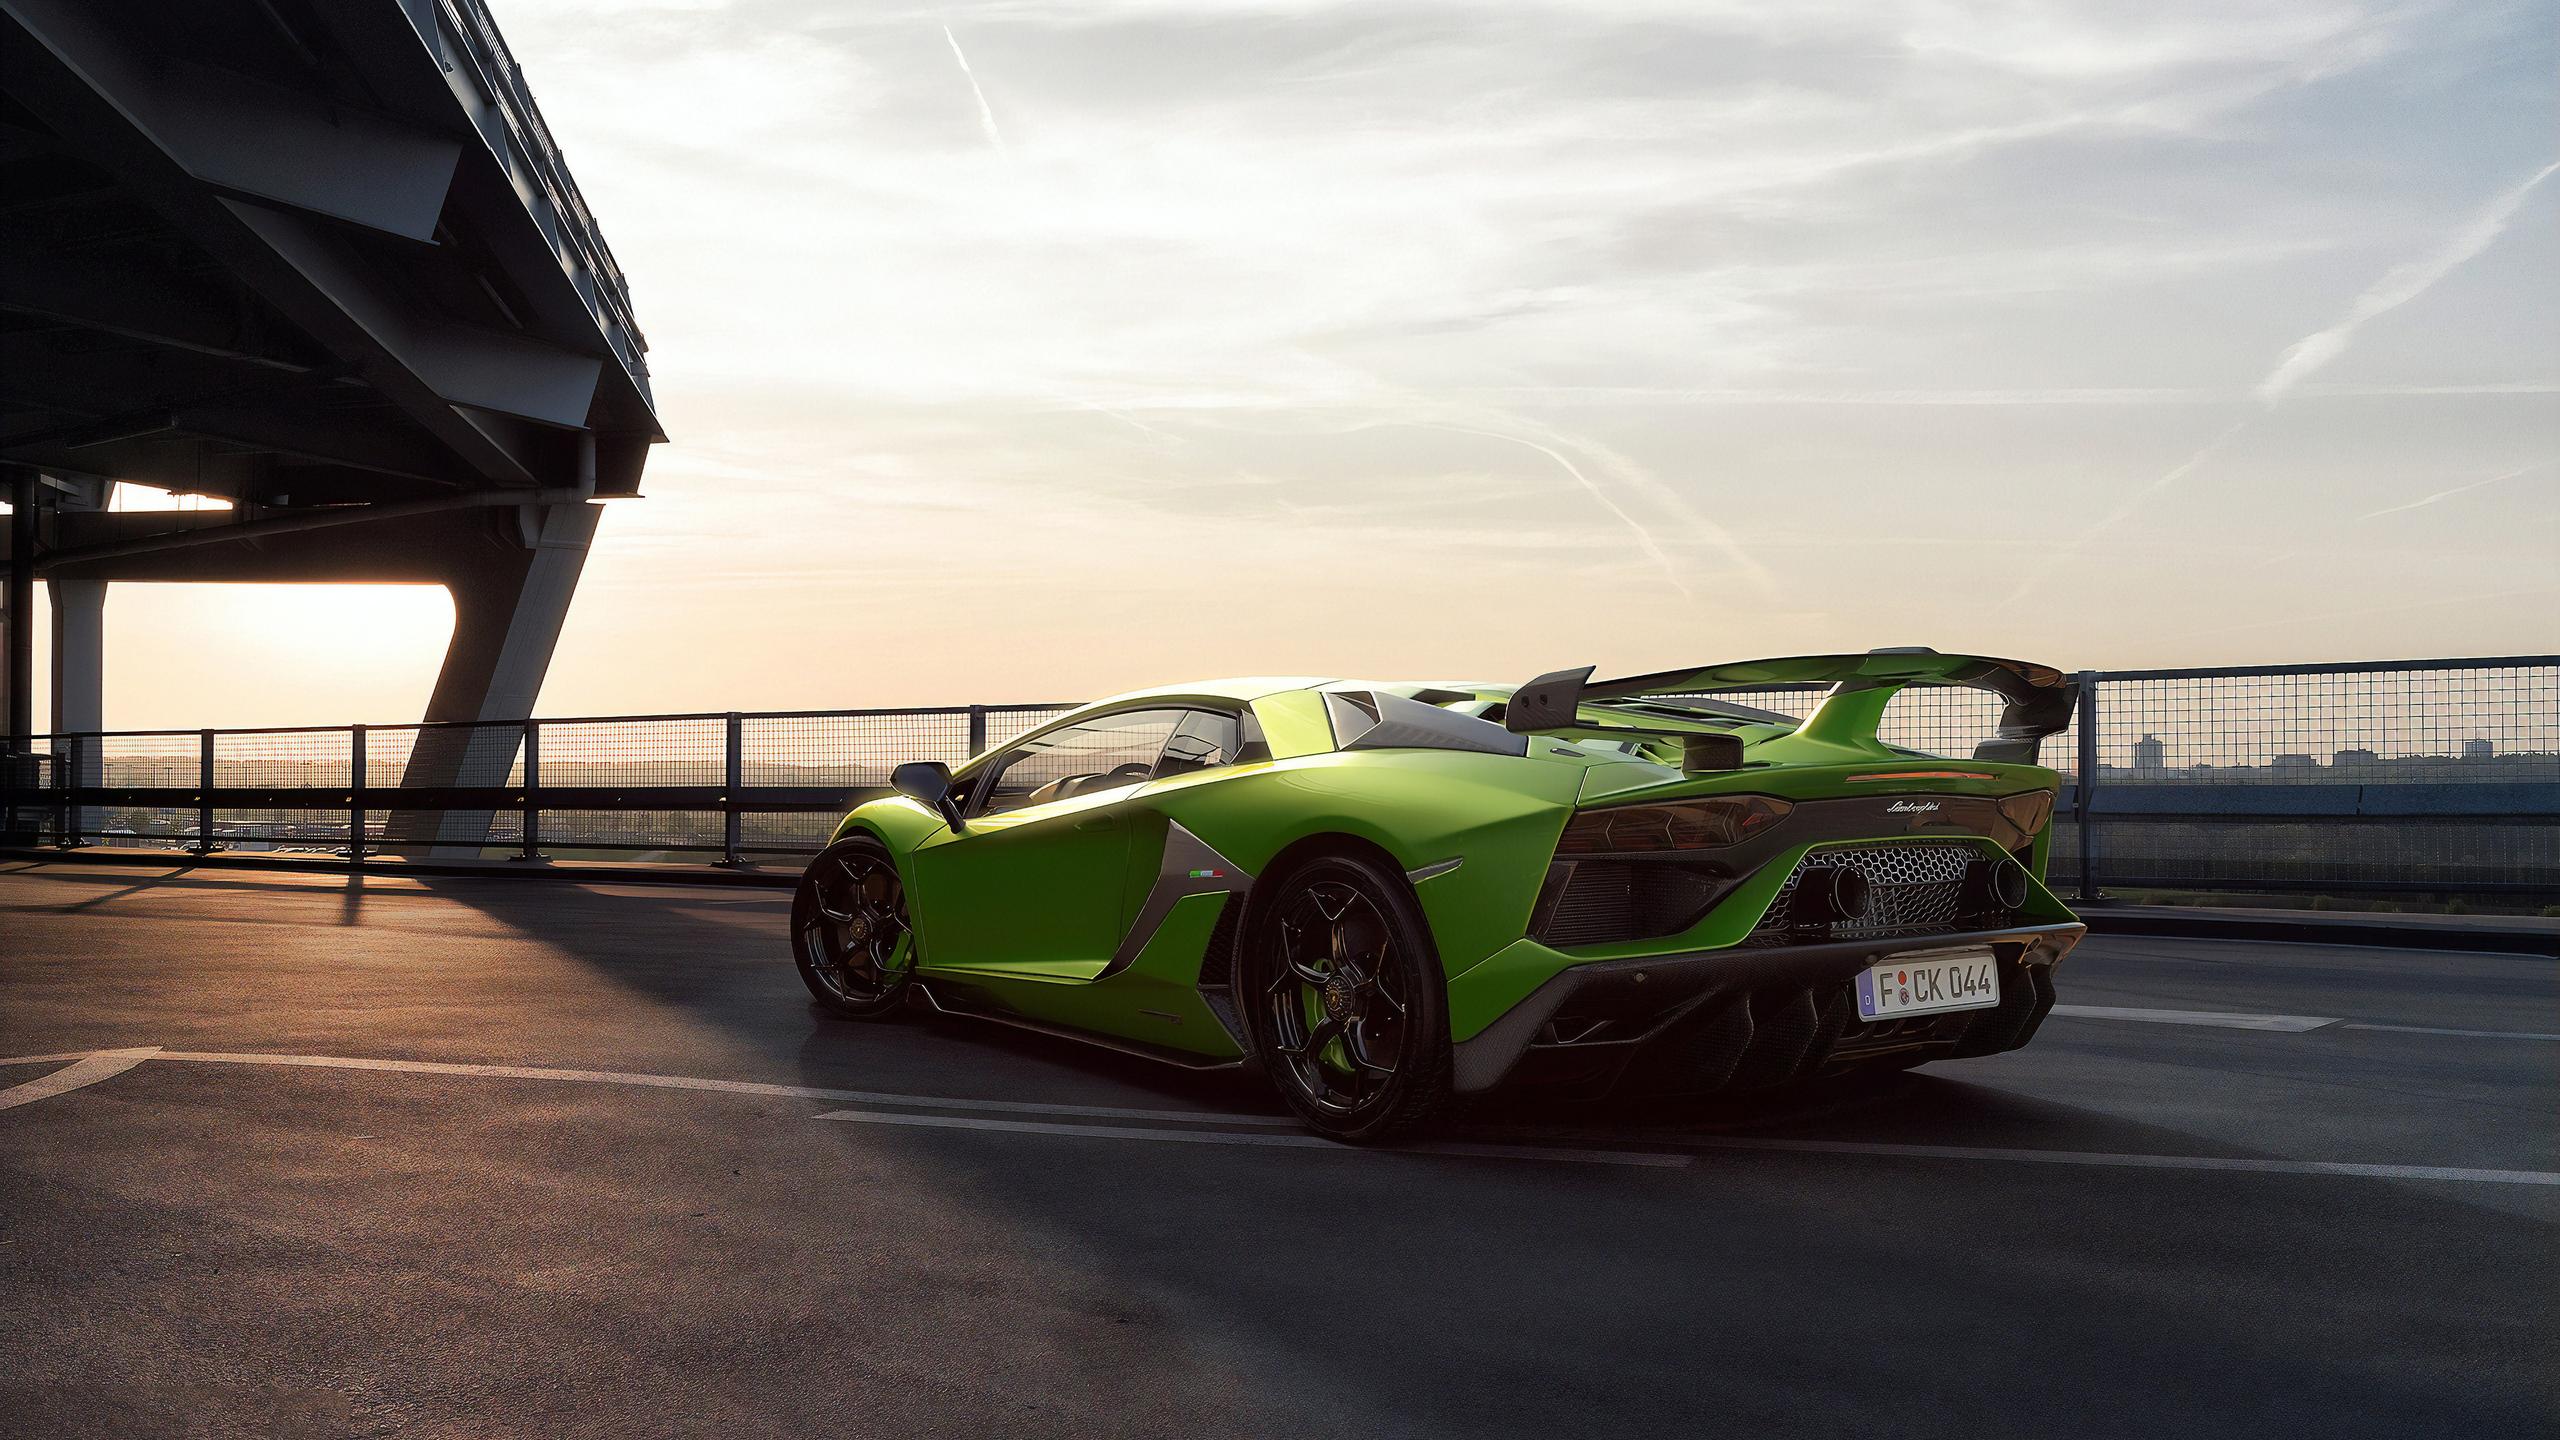 2019 Lamborghini Aventardor Svj 4k 1440p Resolution